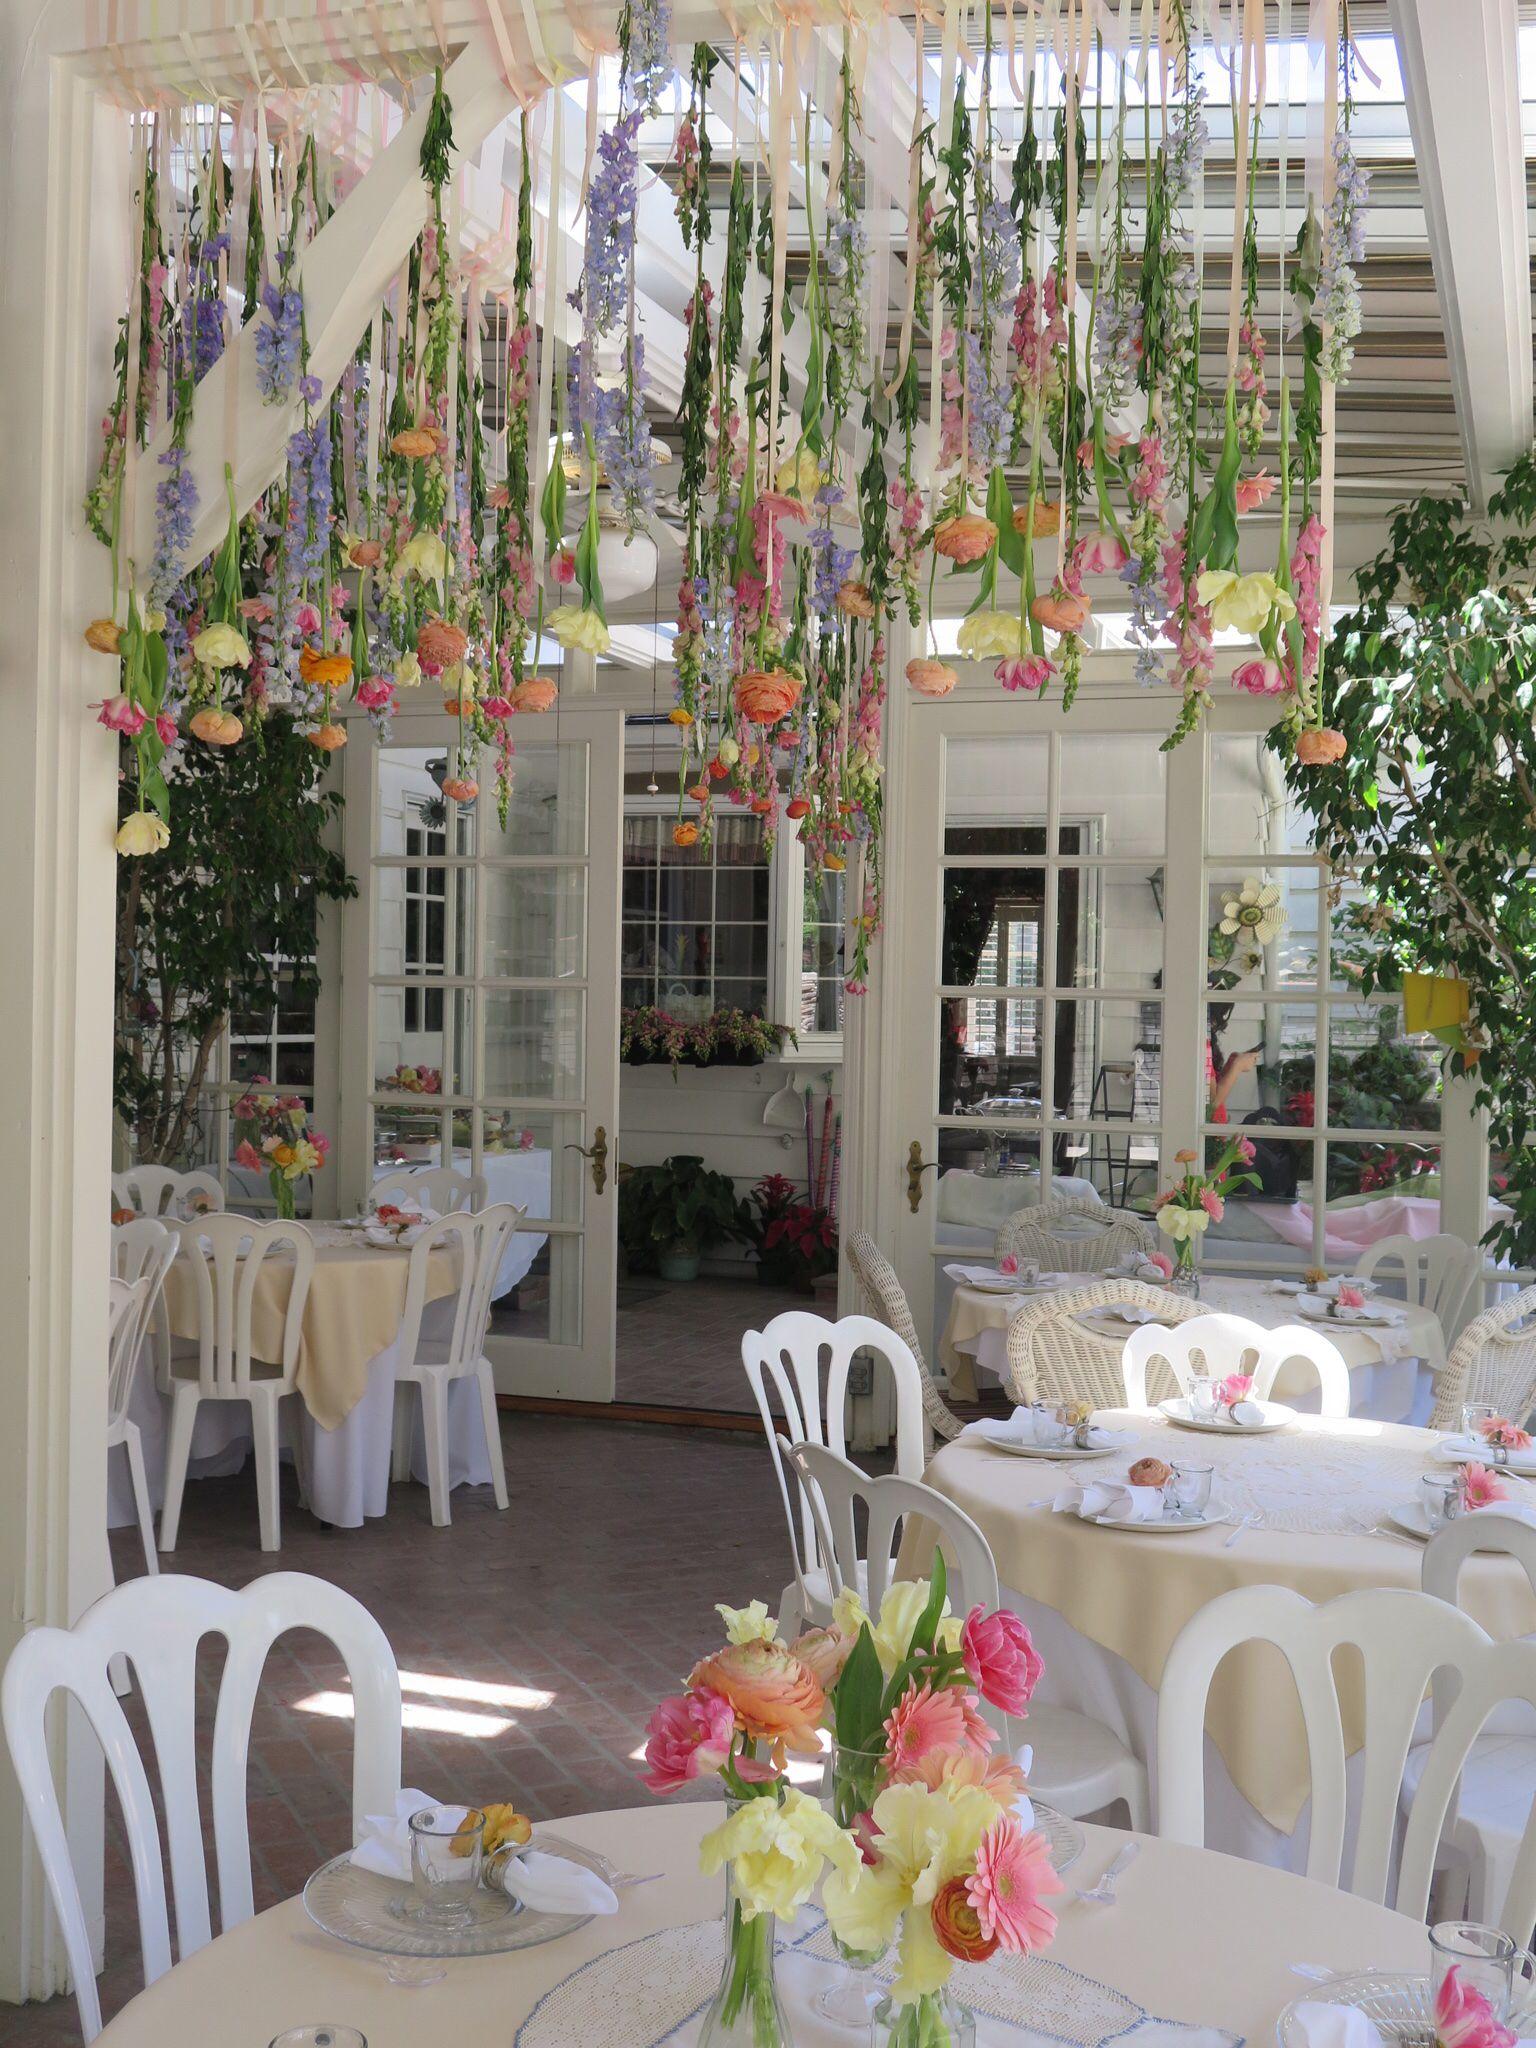 Garden Party Bridal Shower Hanging Flowers Garden Bridal